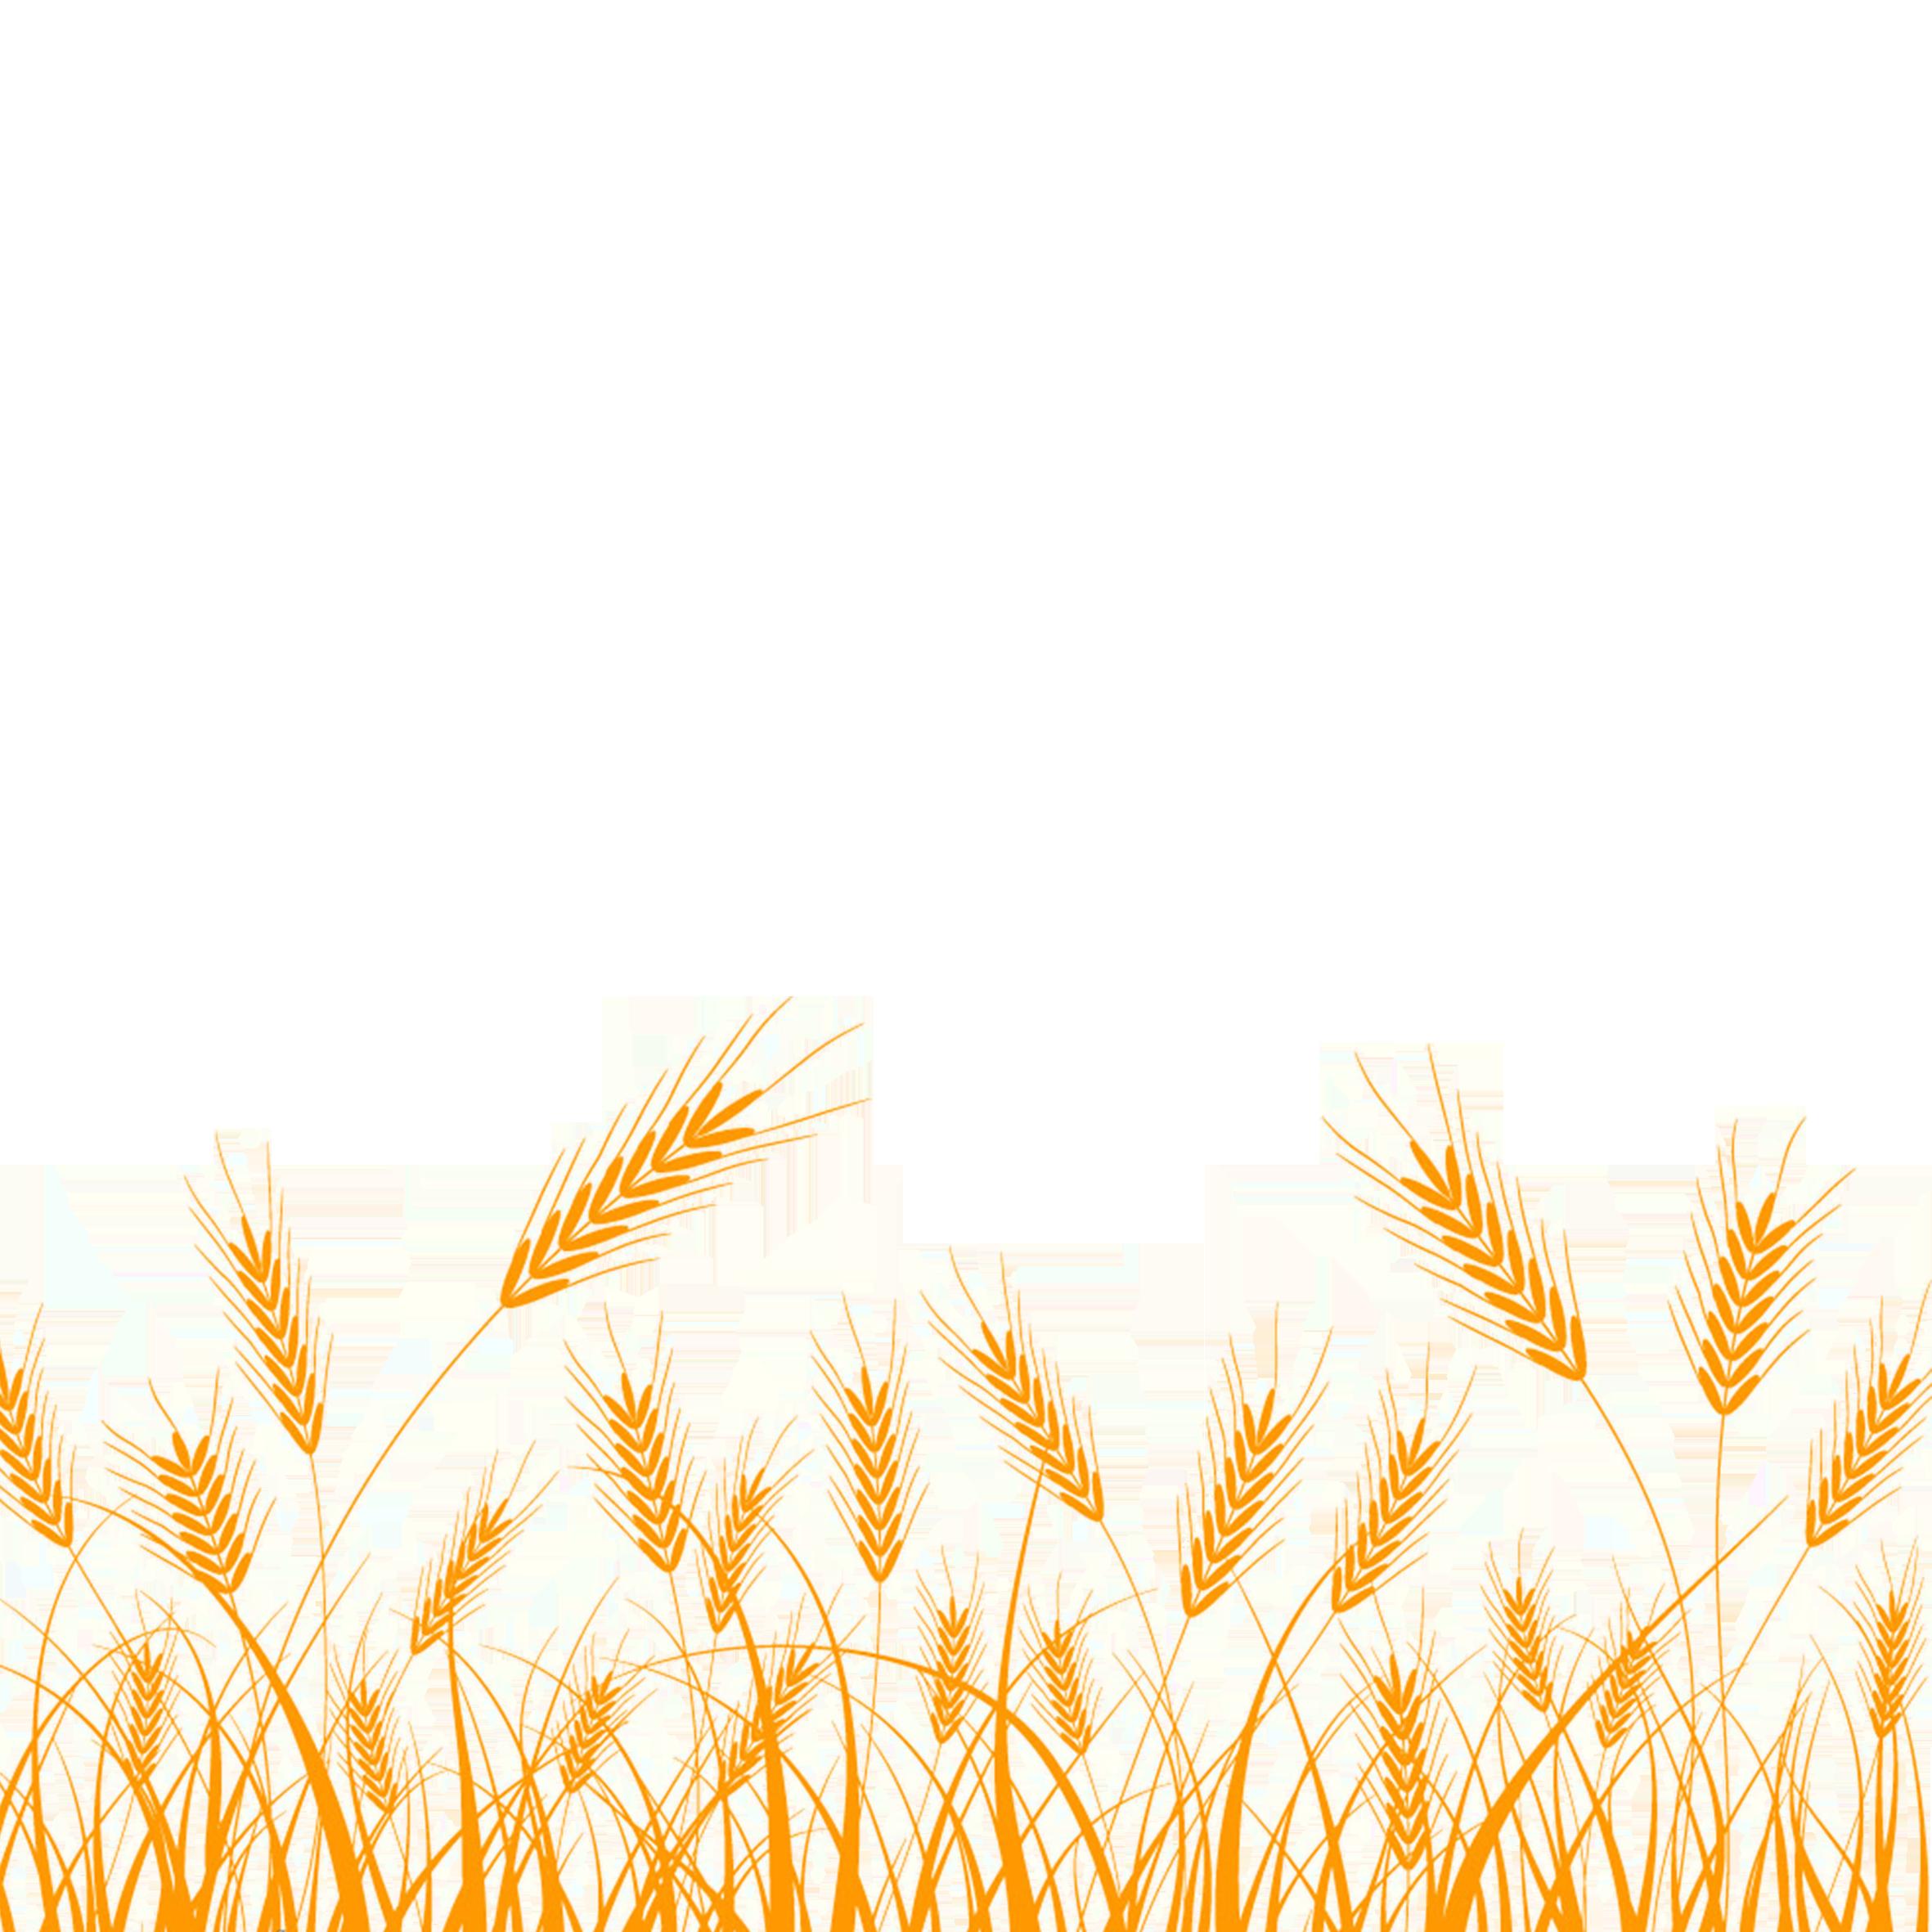 Wheat clip art rice. Clipart grass silhouette